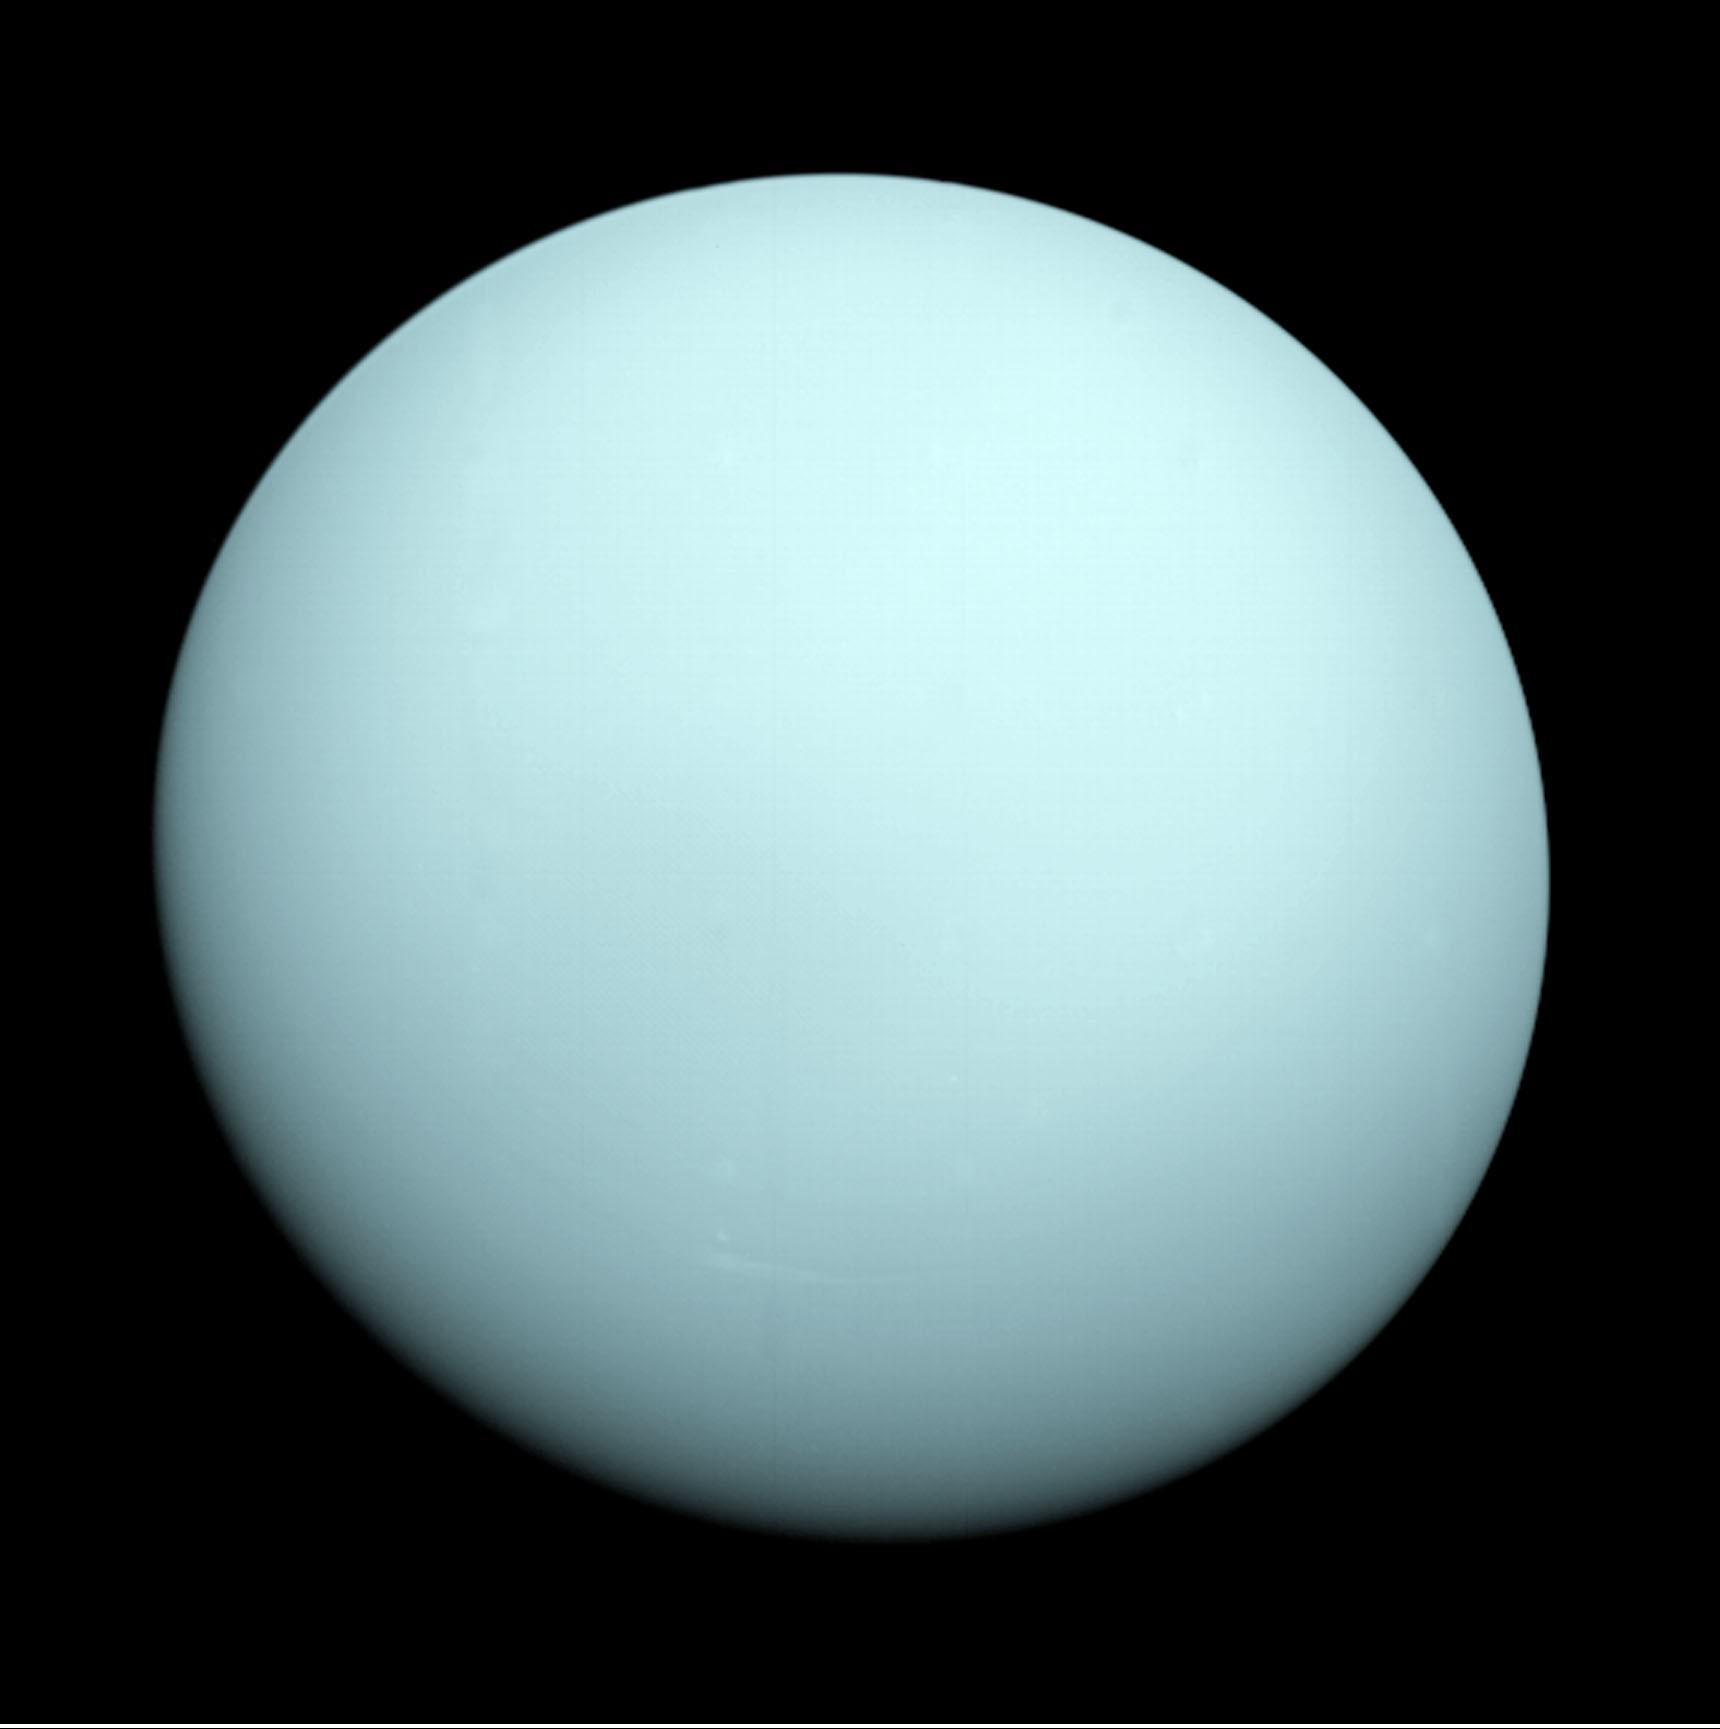 Фотография урана с аппарата вояджер 2